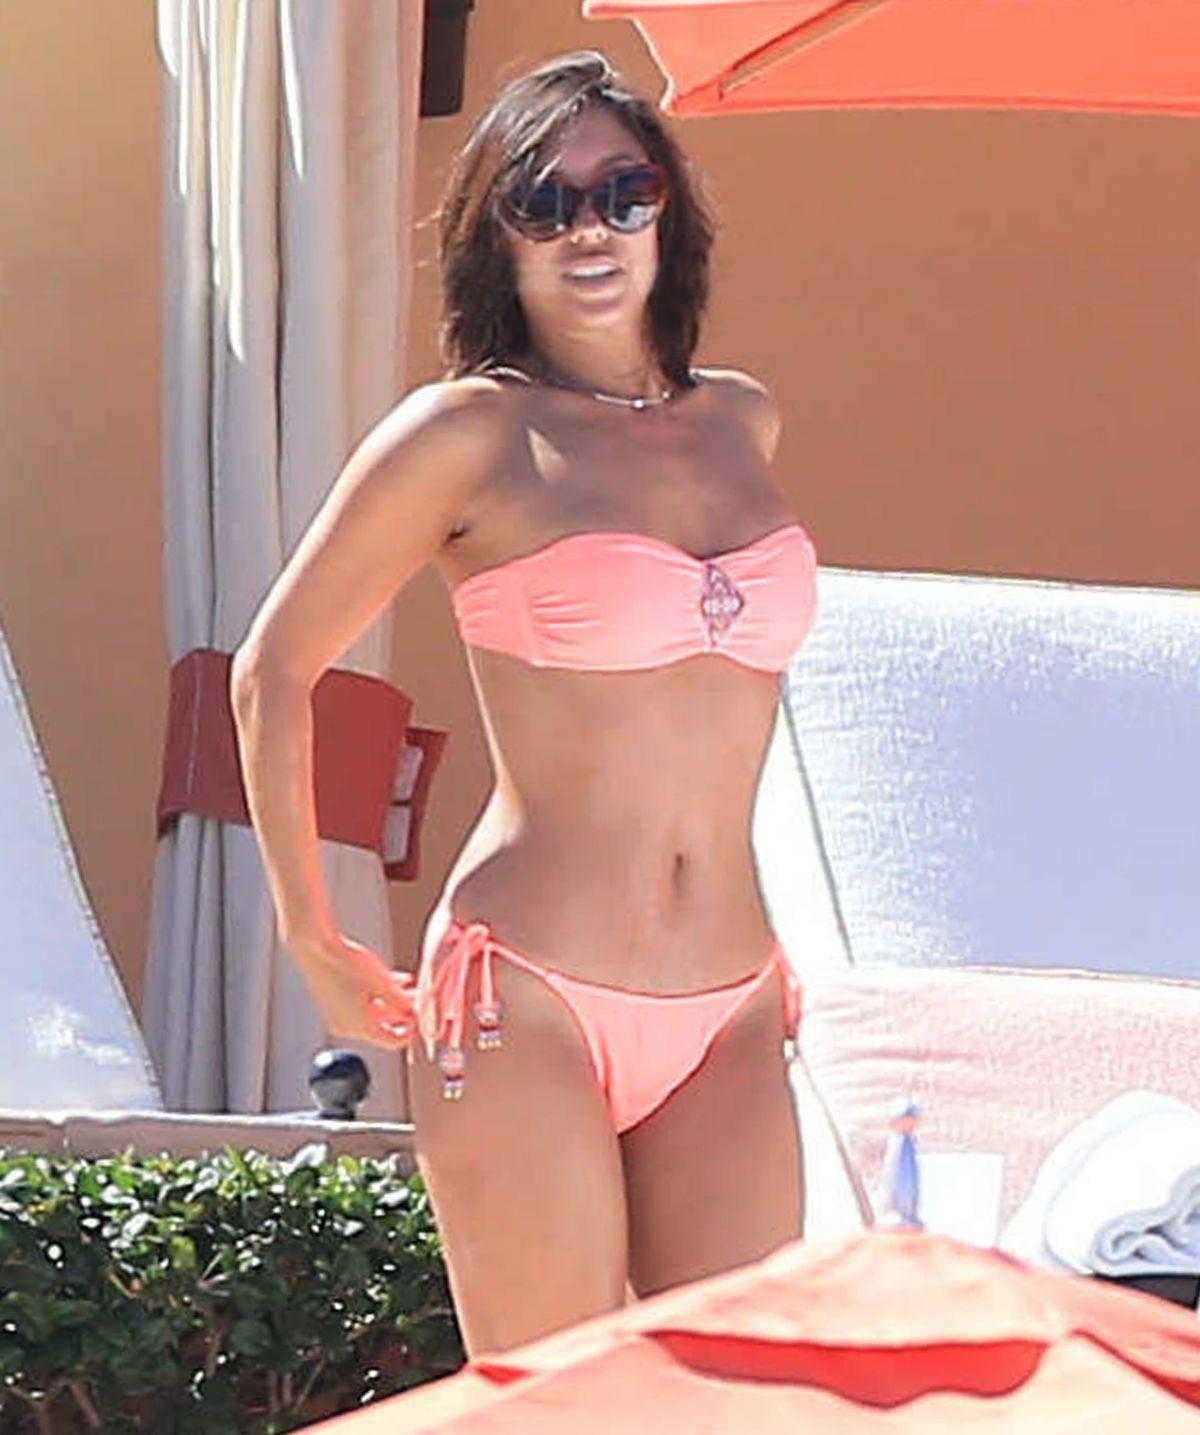 burke pictures Sheryl bikini